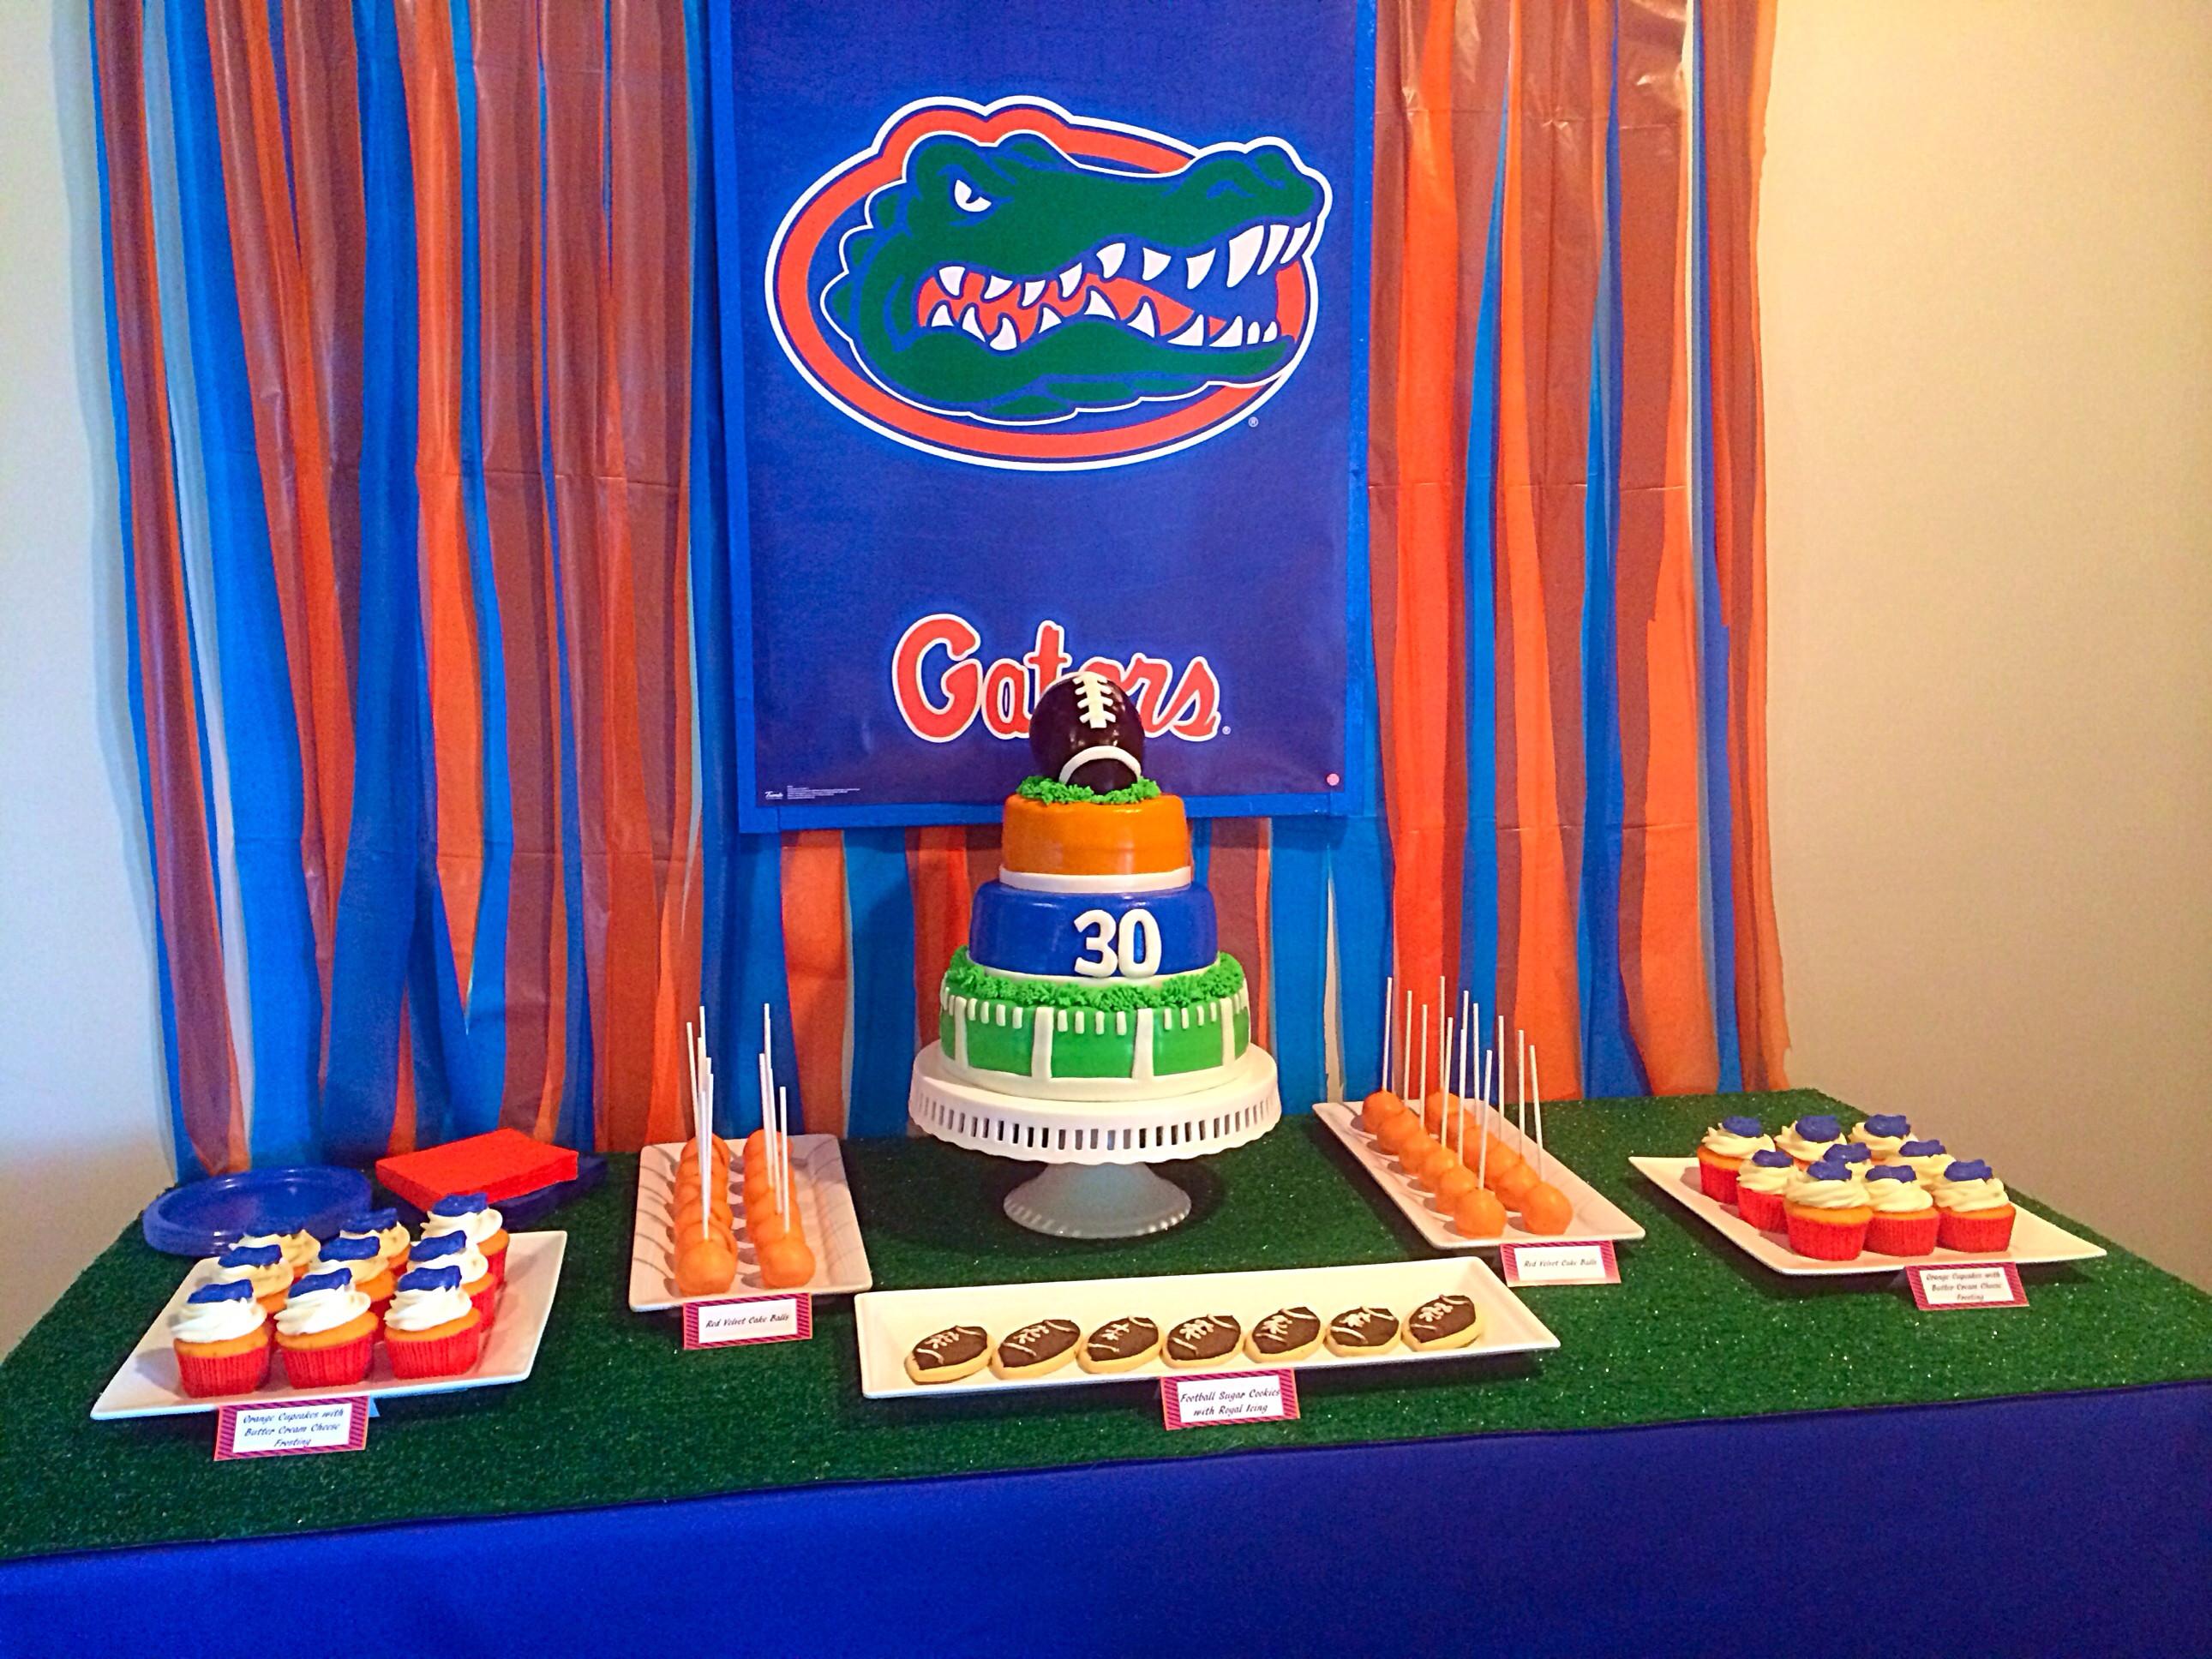 Florida Gators Football Party Dessert Table